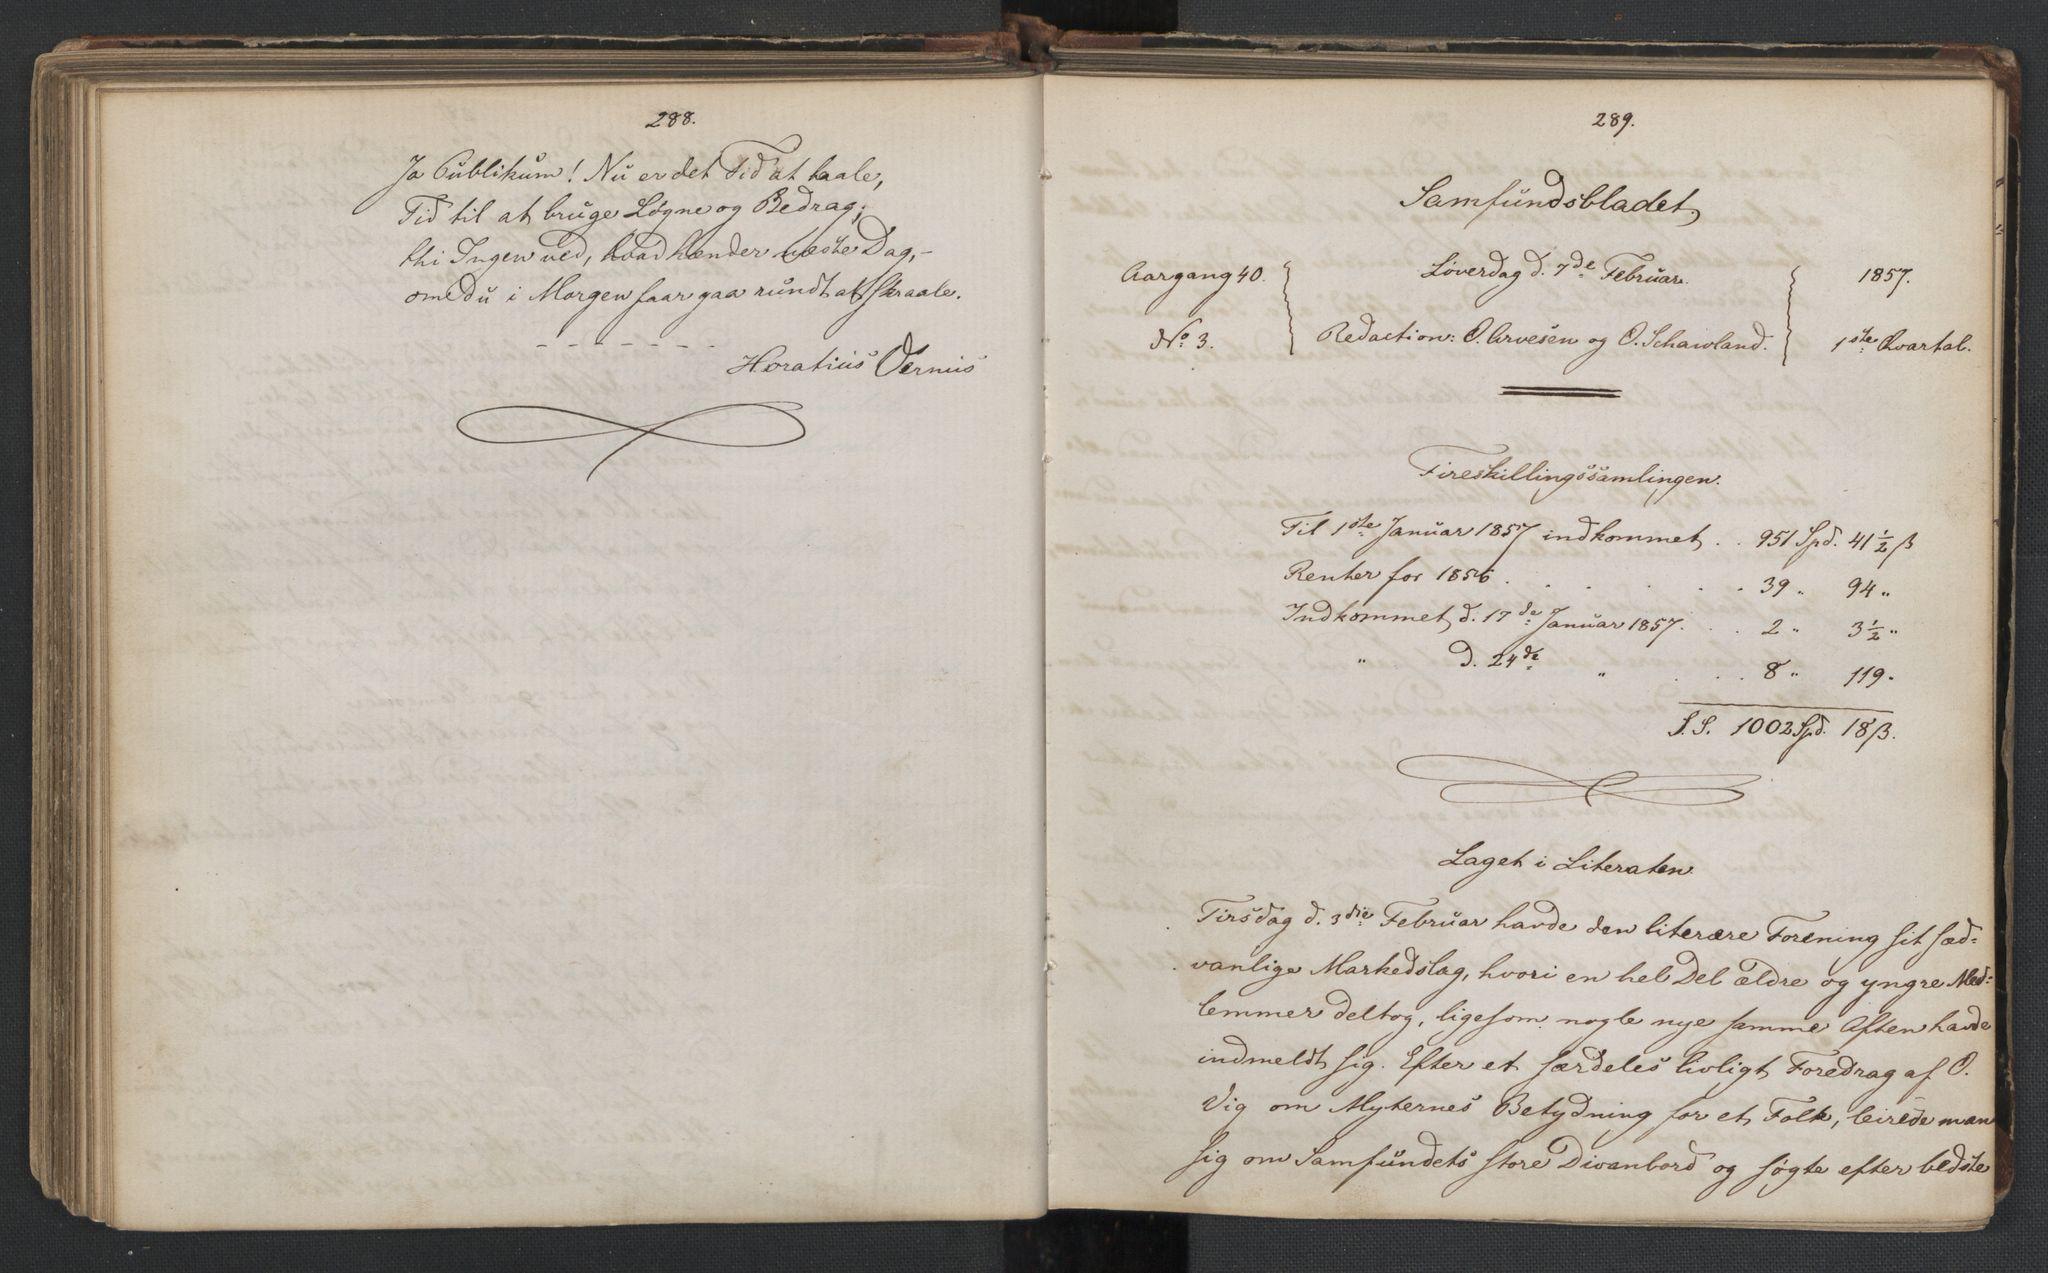 RA, Det Norske Studentersamfund, X/Xa/L0006, 1856-1857, s. 148